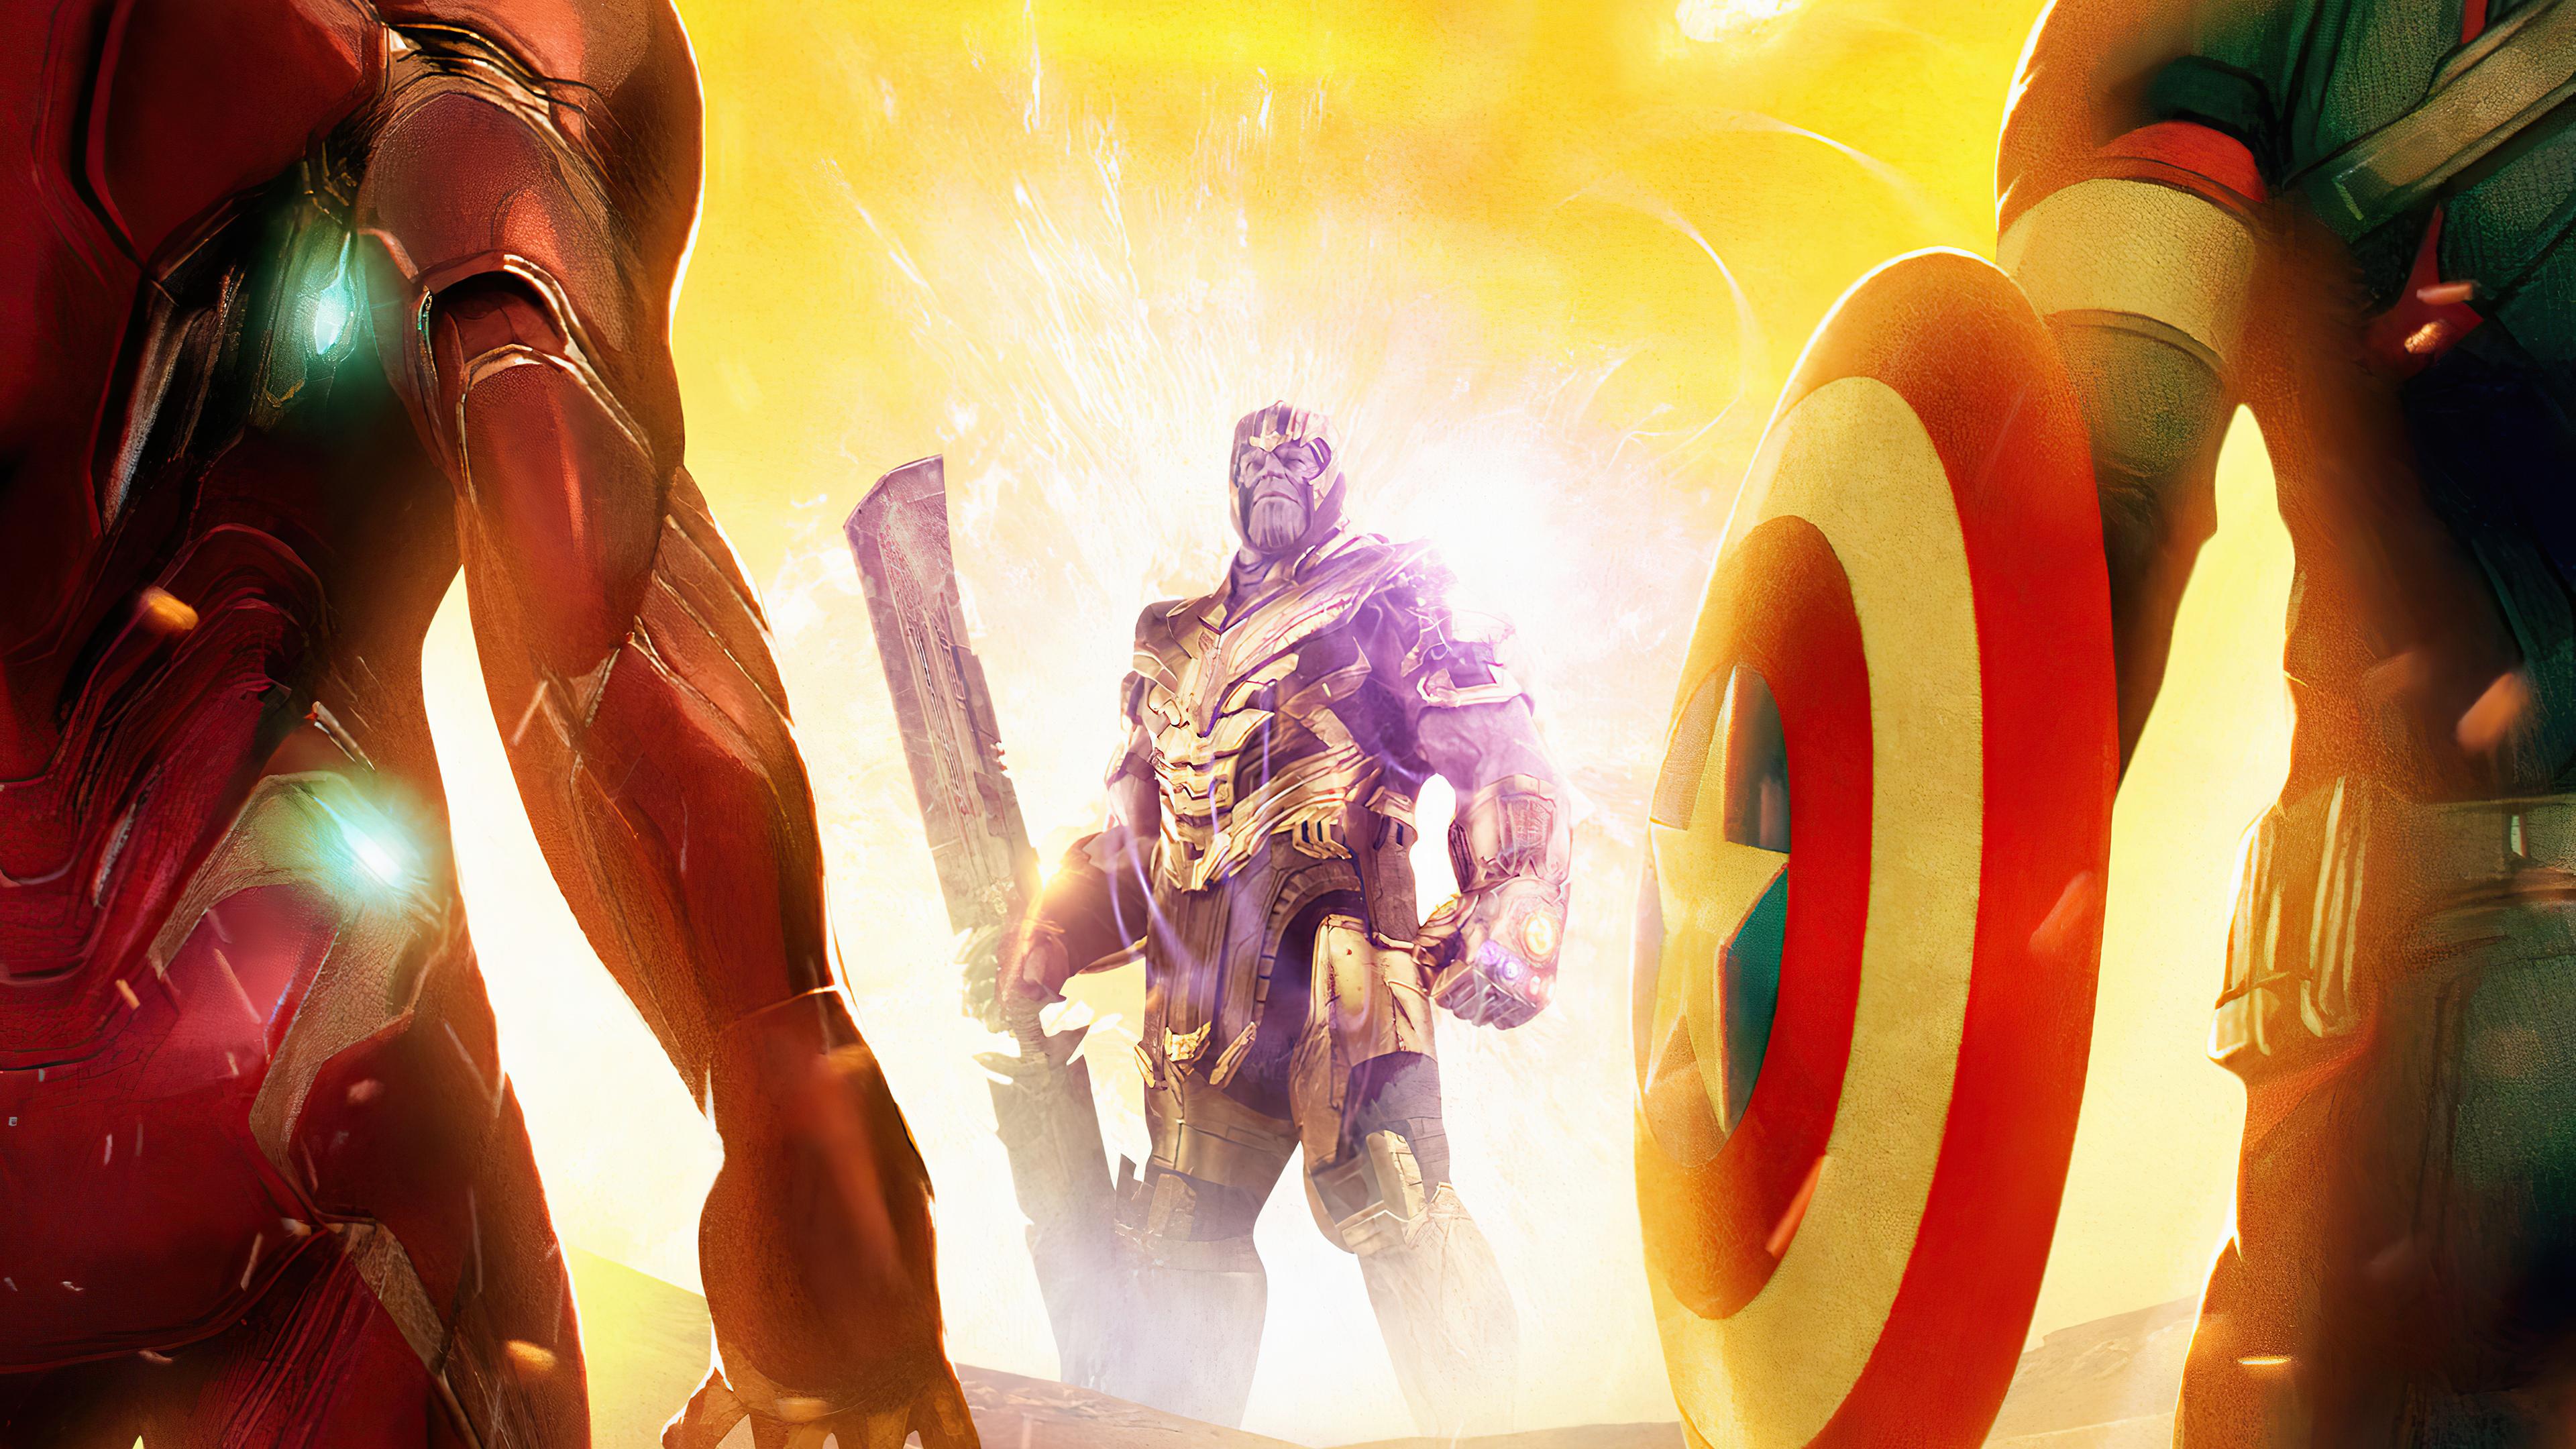 thanos avengers end game 4k 1619216301 - Thanos Avengers End Game 4k - Thanos Avengers End Game 4k wallpapers